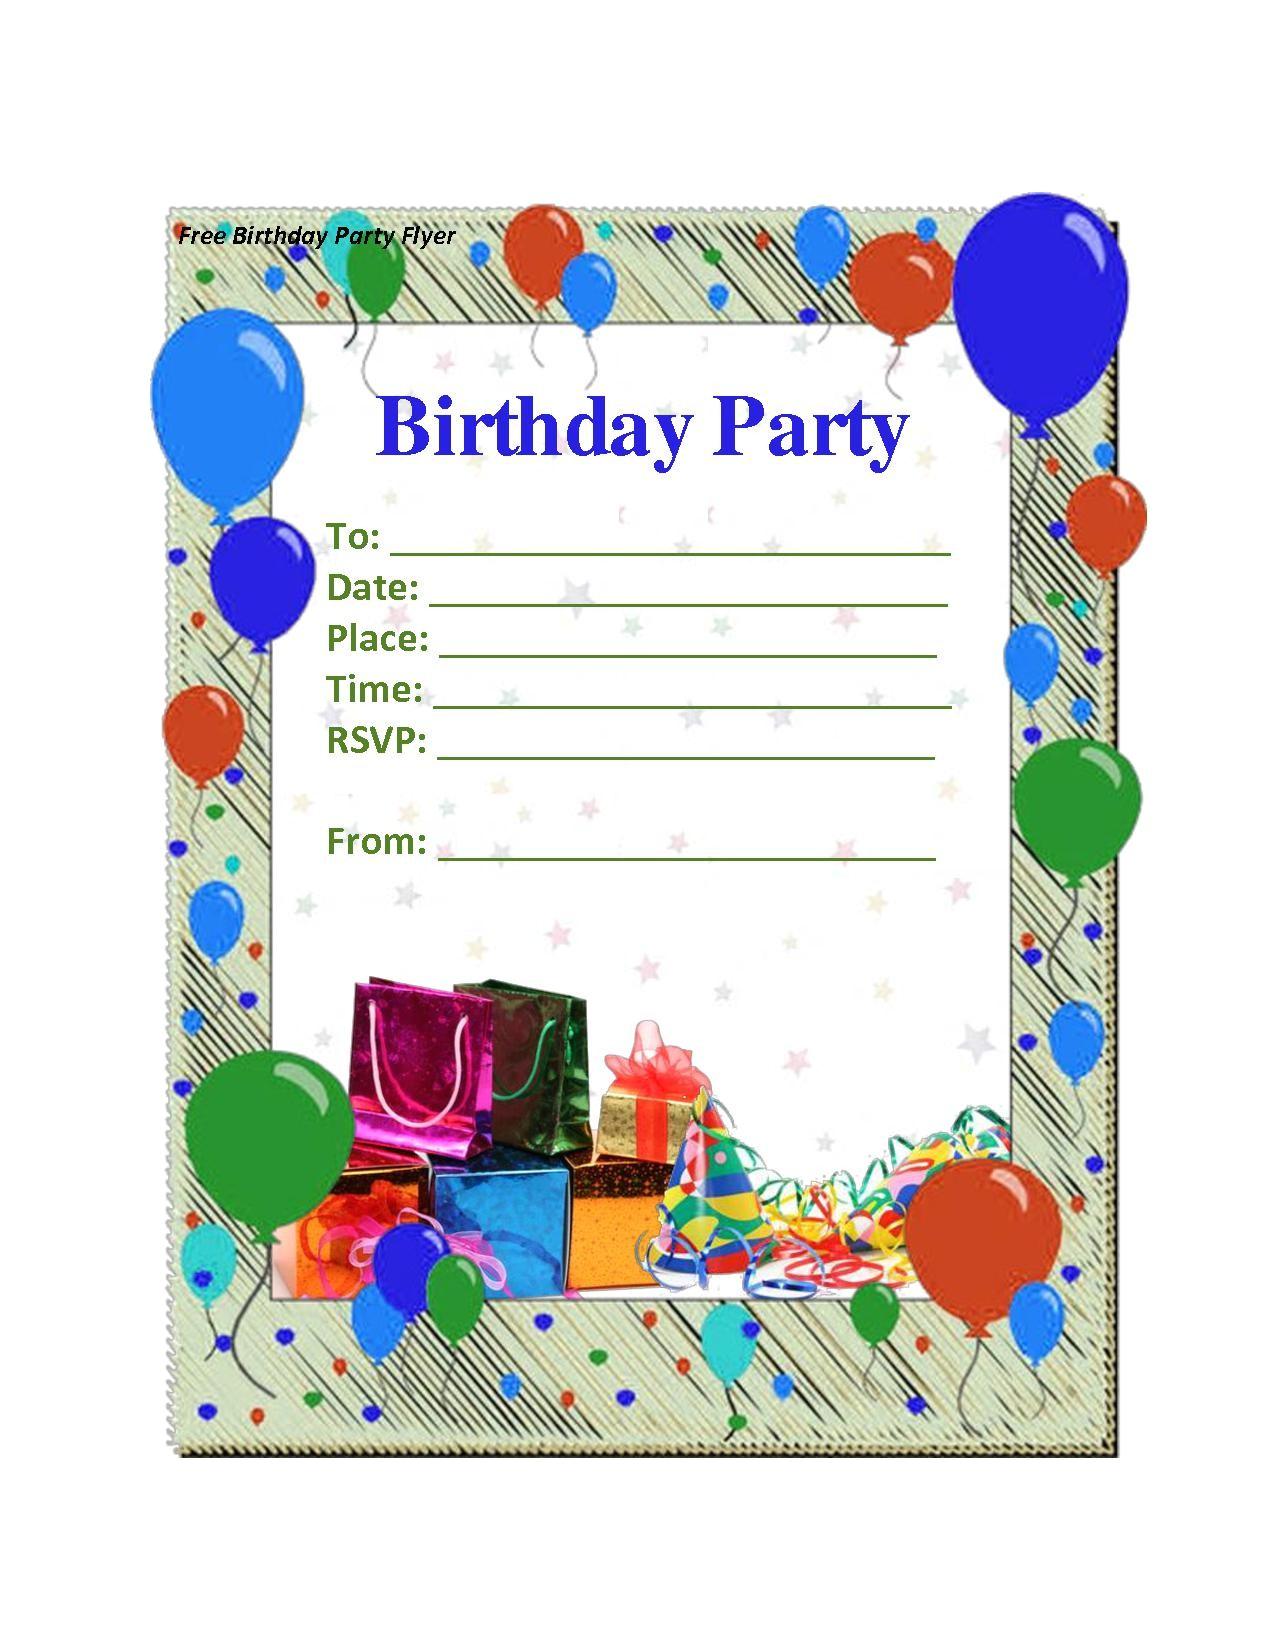 Party theme Invitation Templates Free Birthday Party Invitation Templates